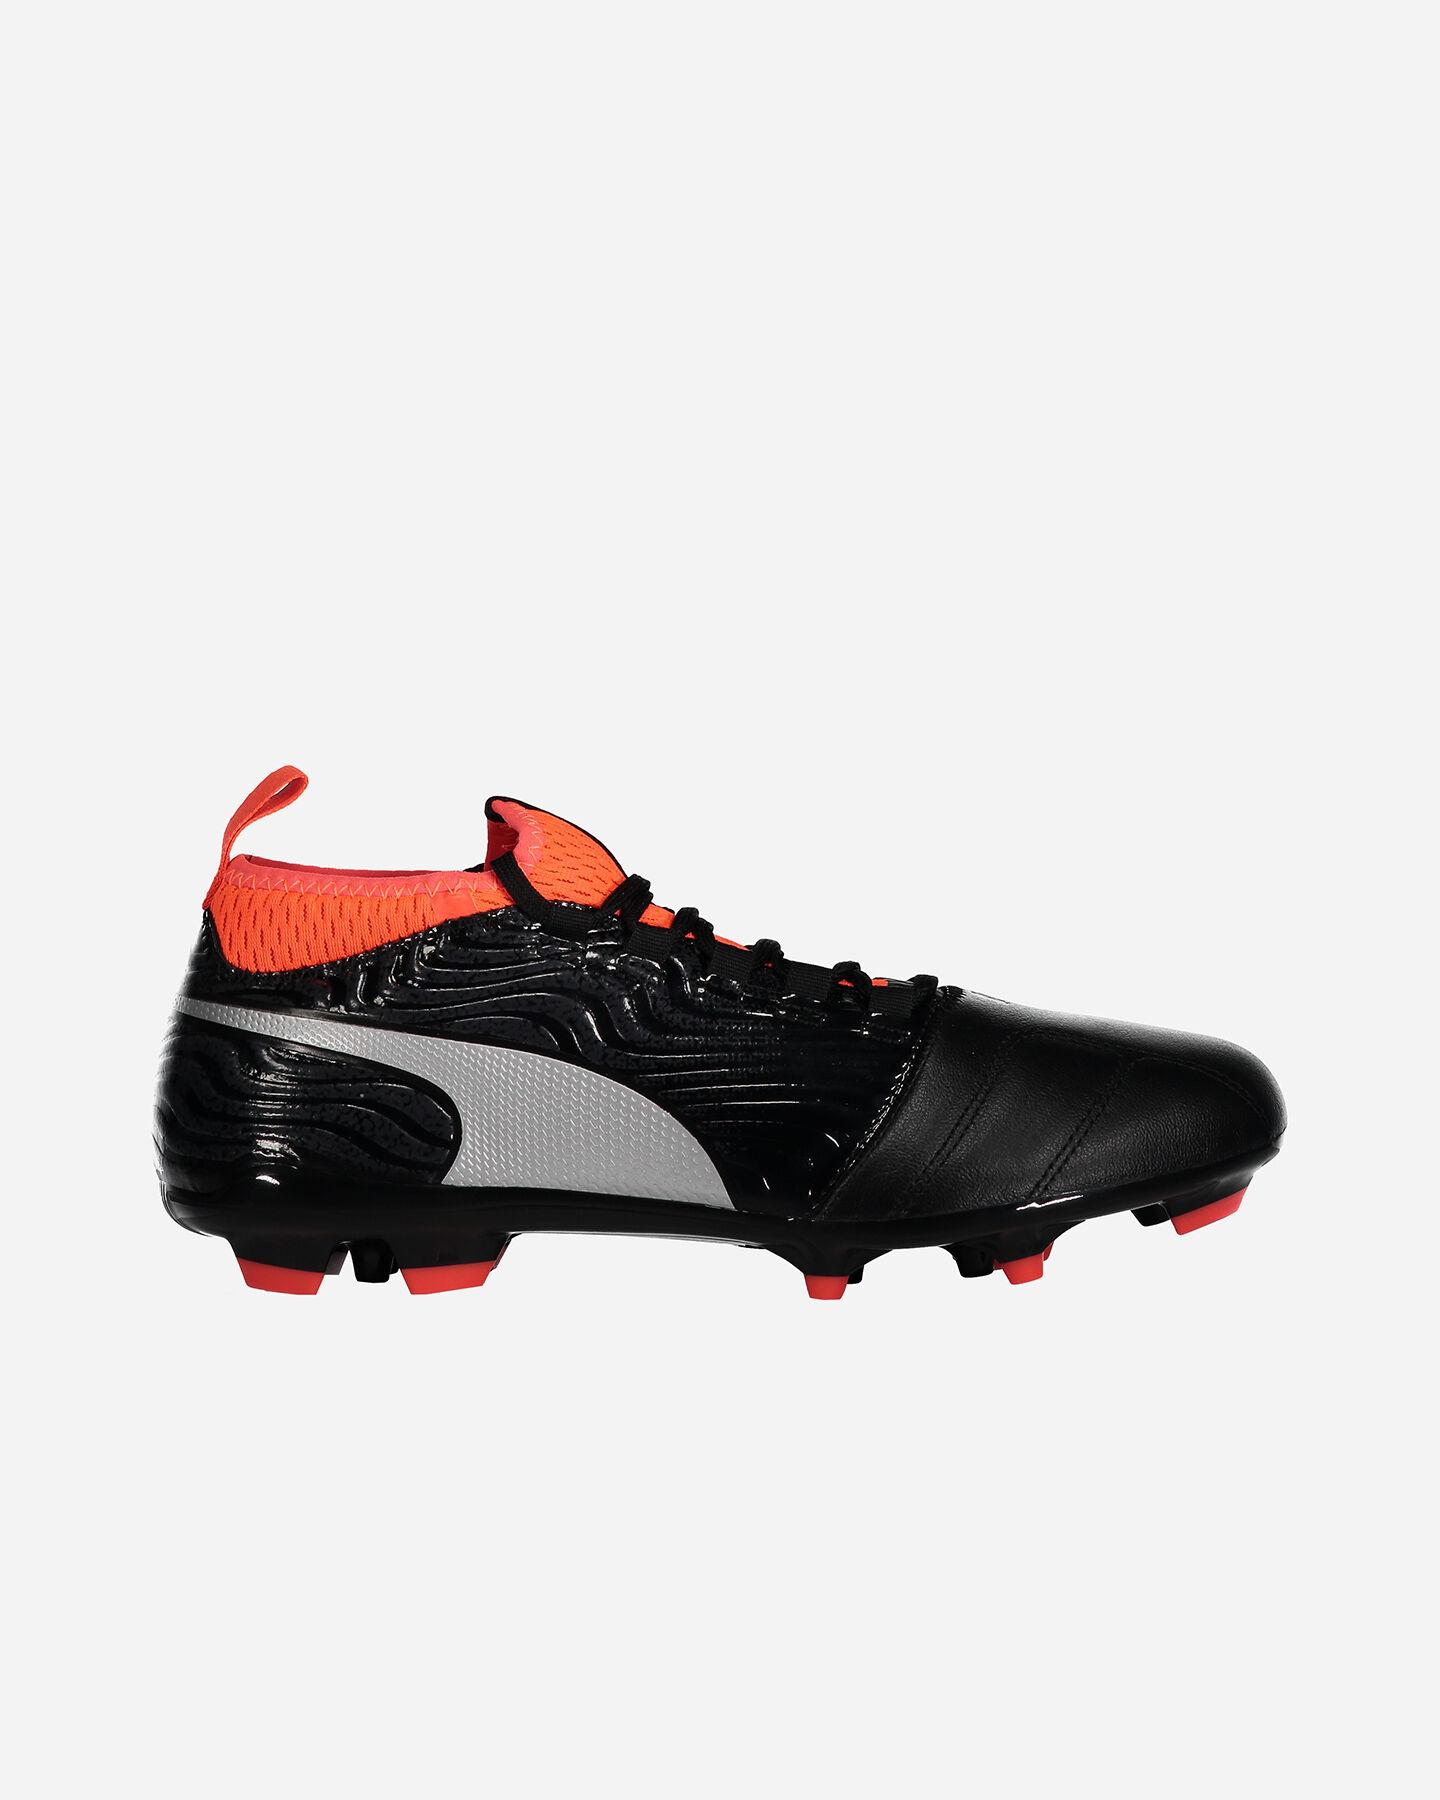 One Su Sport 18 104536 Calcio Puma Scarpe 3 Ag 001 Cisalfa M dzFnqBnw